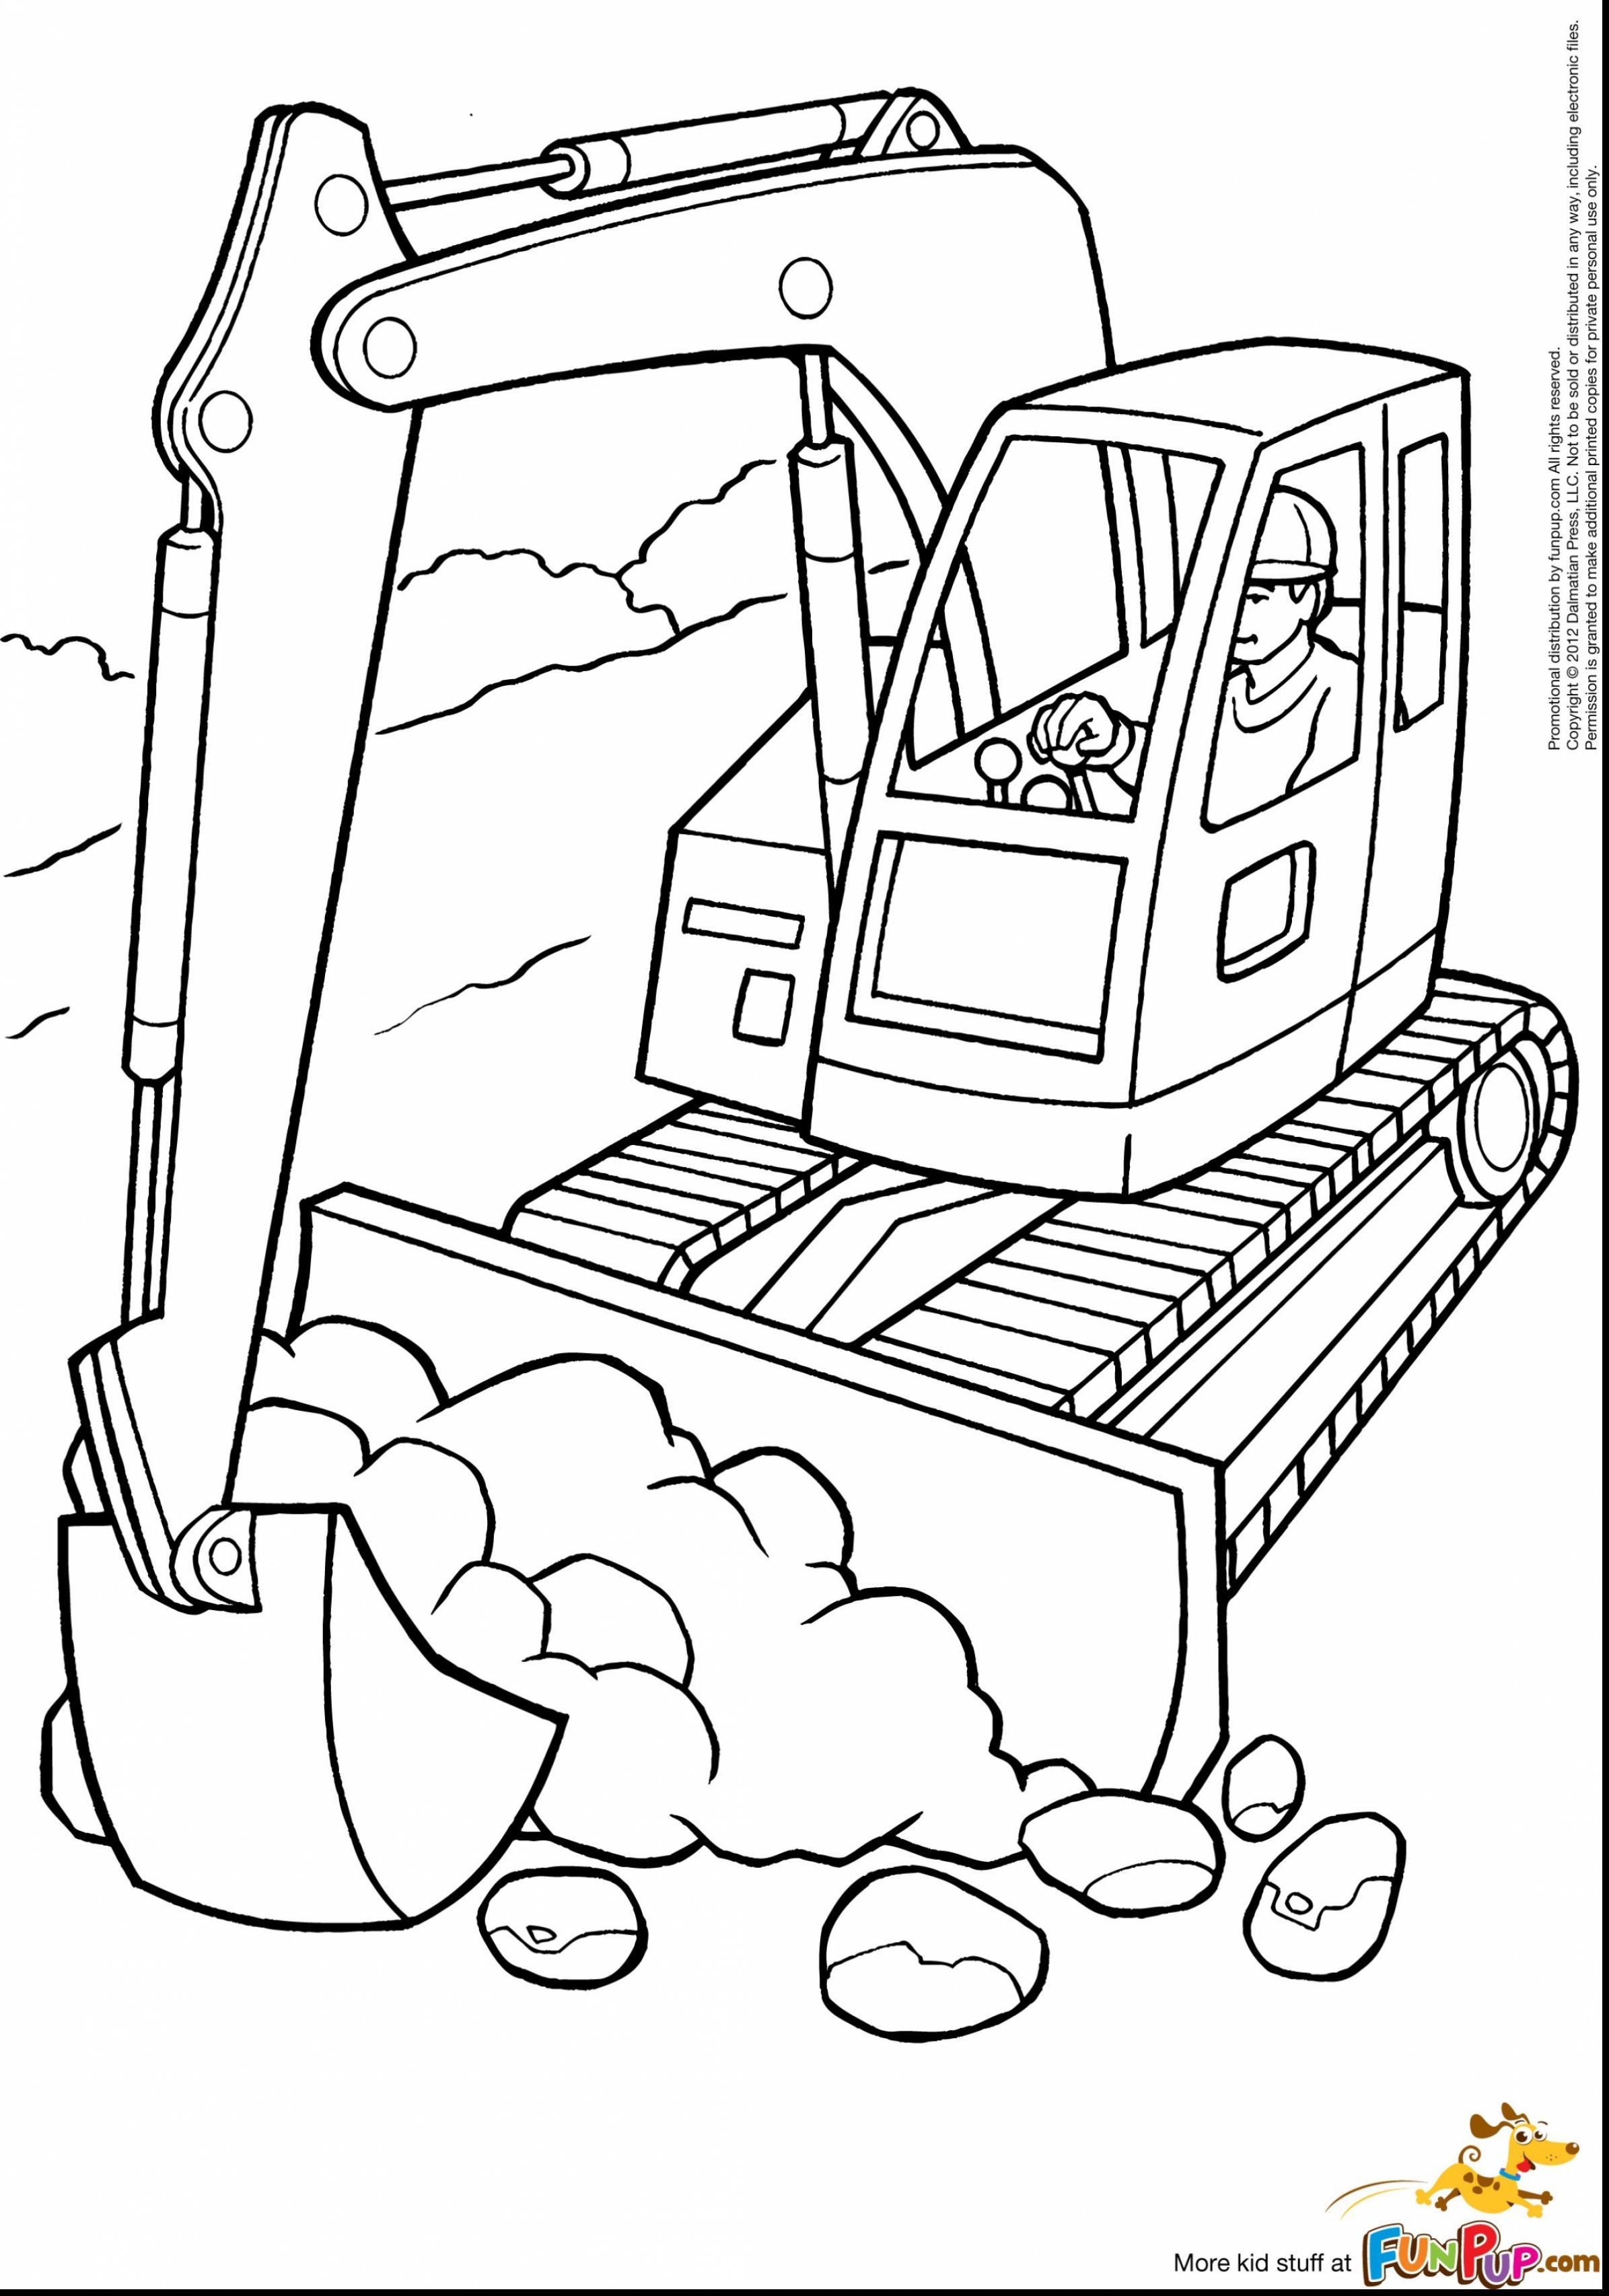 2391x3411 Modest Hatchet Man Coloring Pages Uncategorized Icp Page